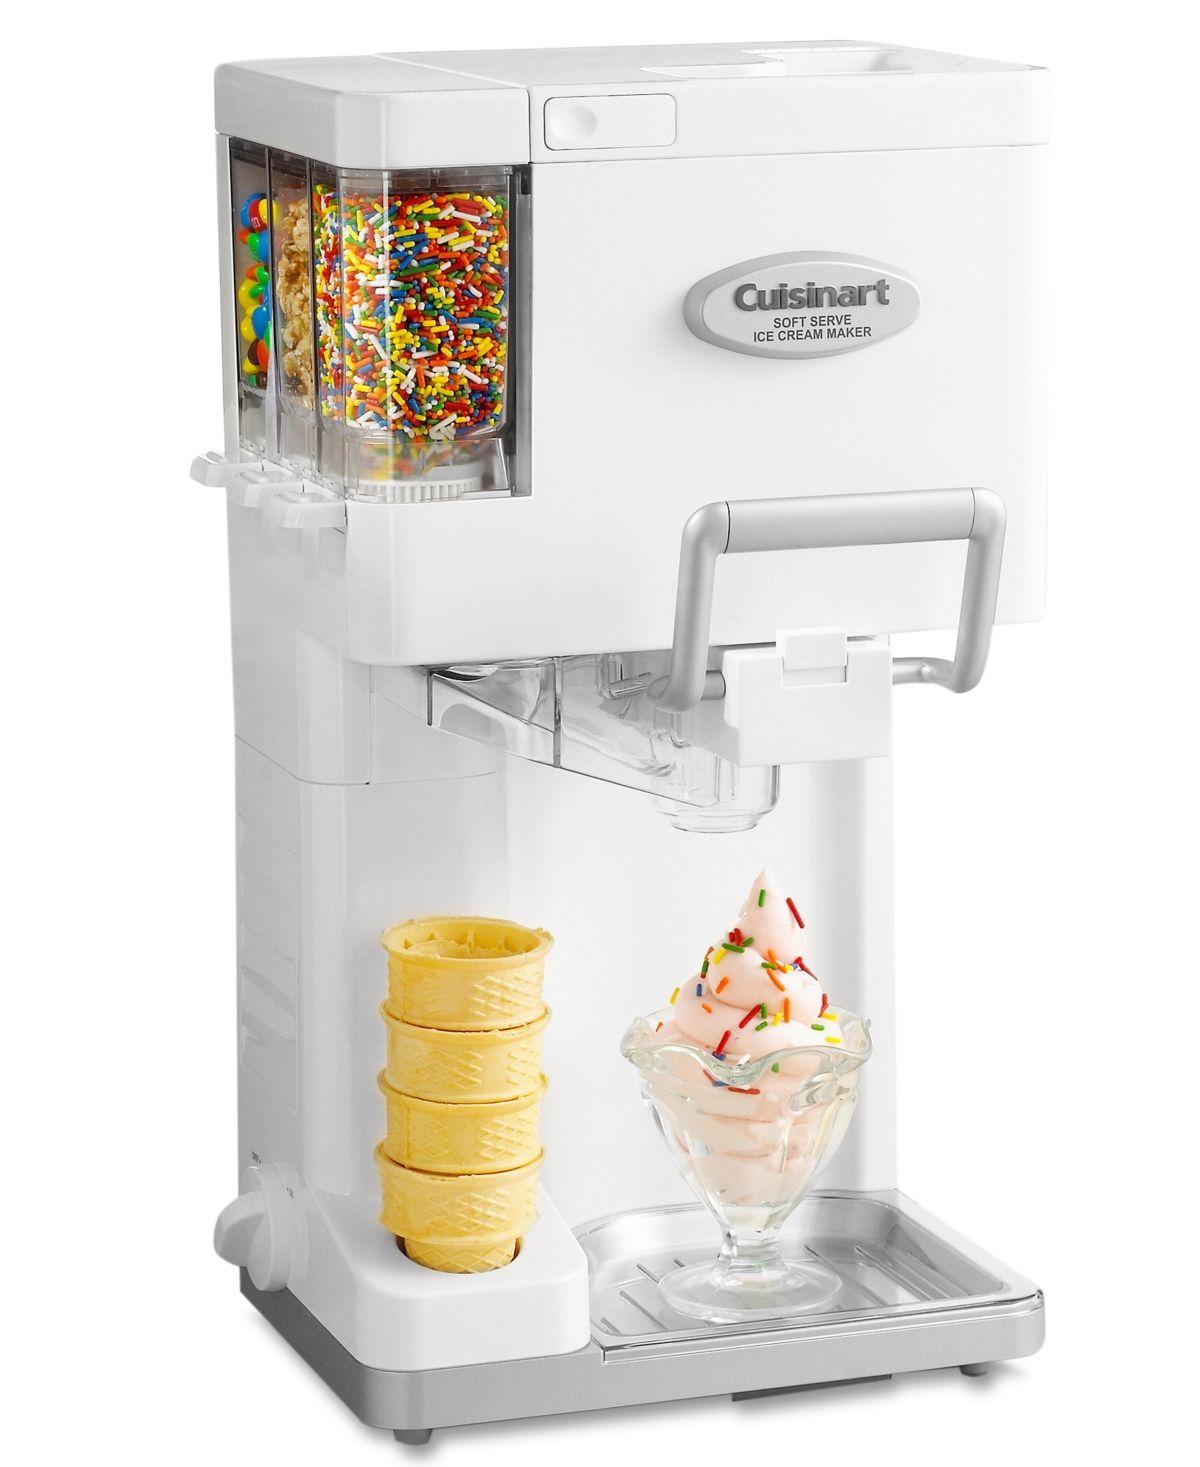 Cuisinart Ice 45 Ice Cream Maker Soft Serve Mix It In Ice Cream Maker Soft Serve Ice Cream Cuisinart Ice Cream Maker